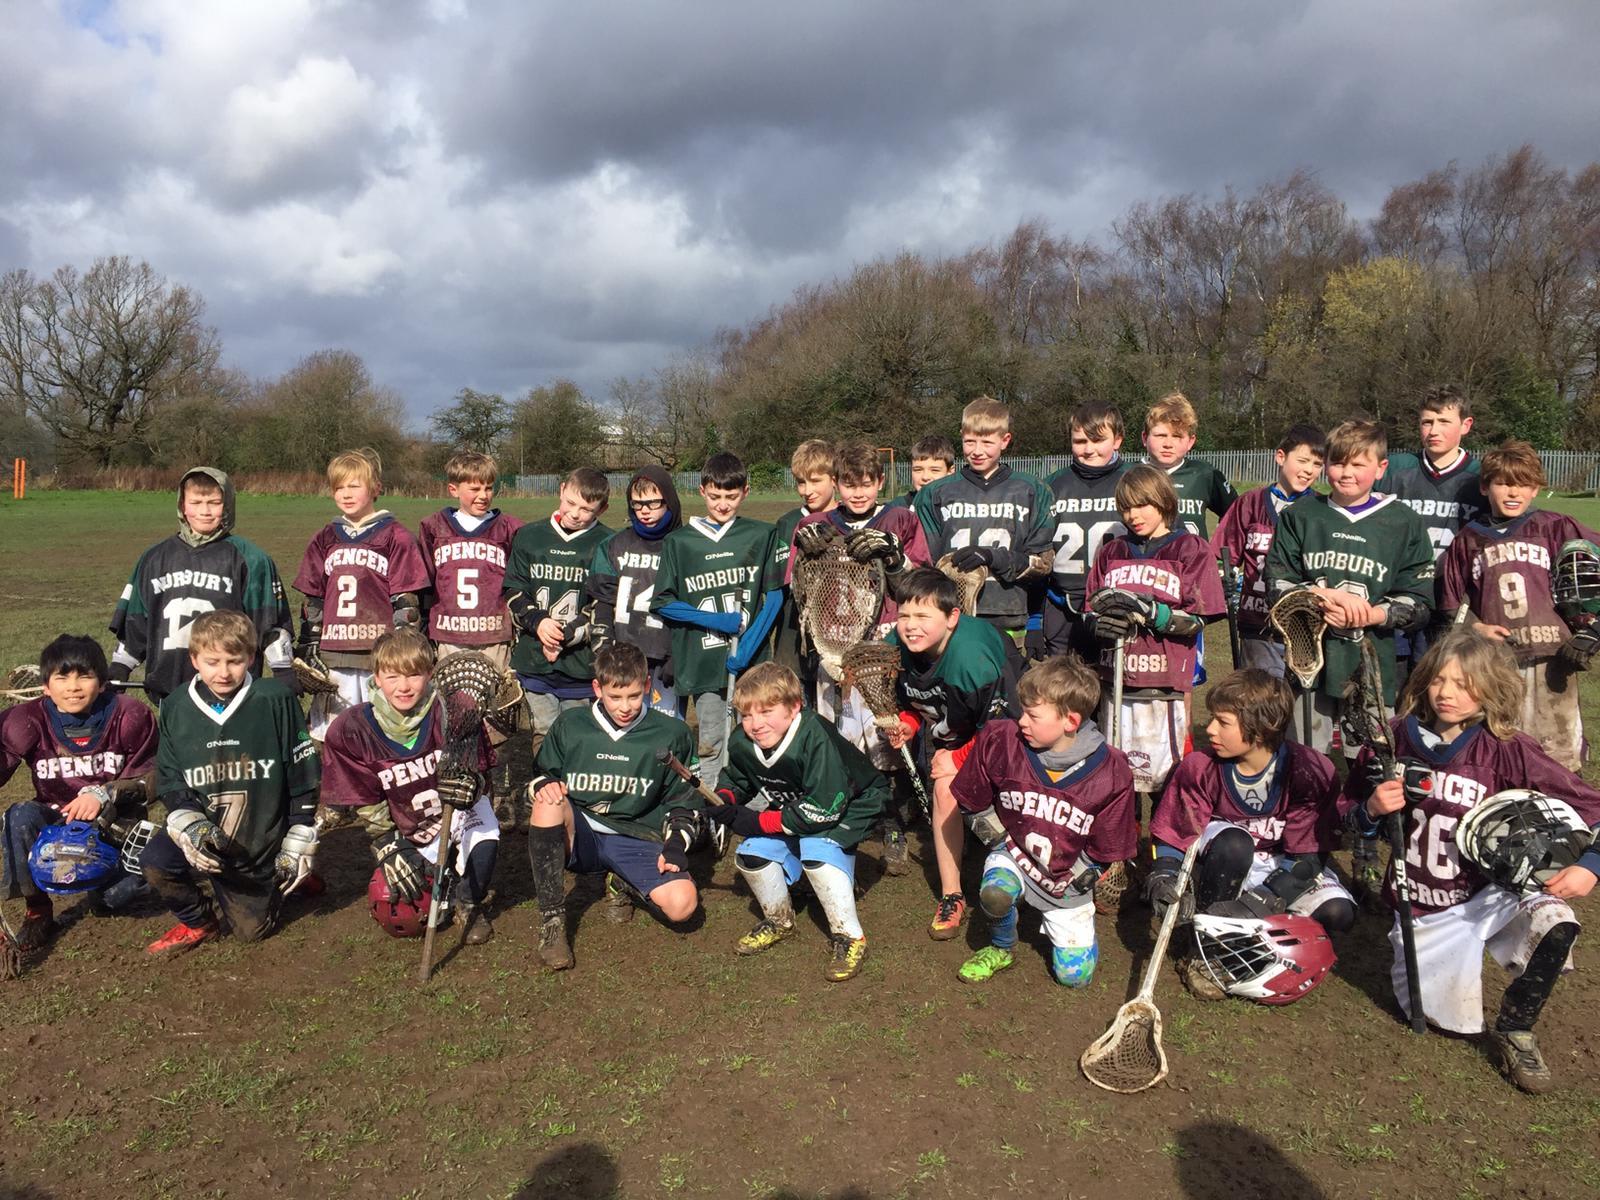 SJNT-19-The-Teams-at-Norbury